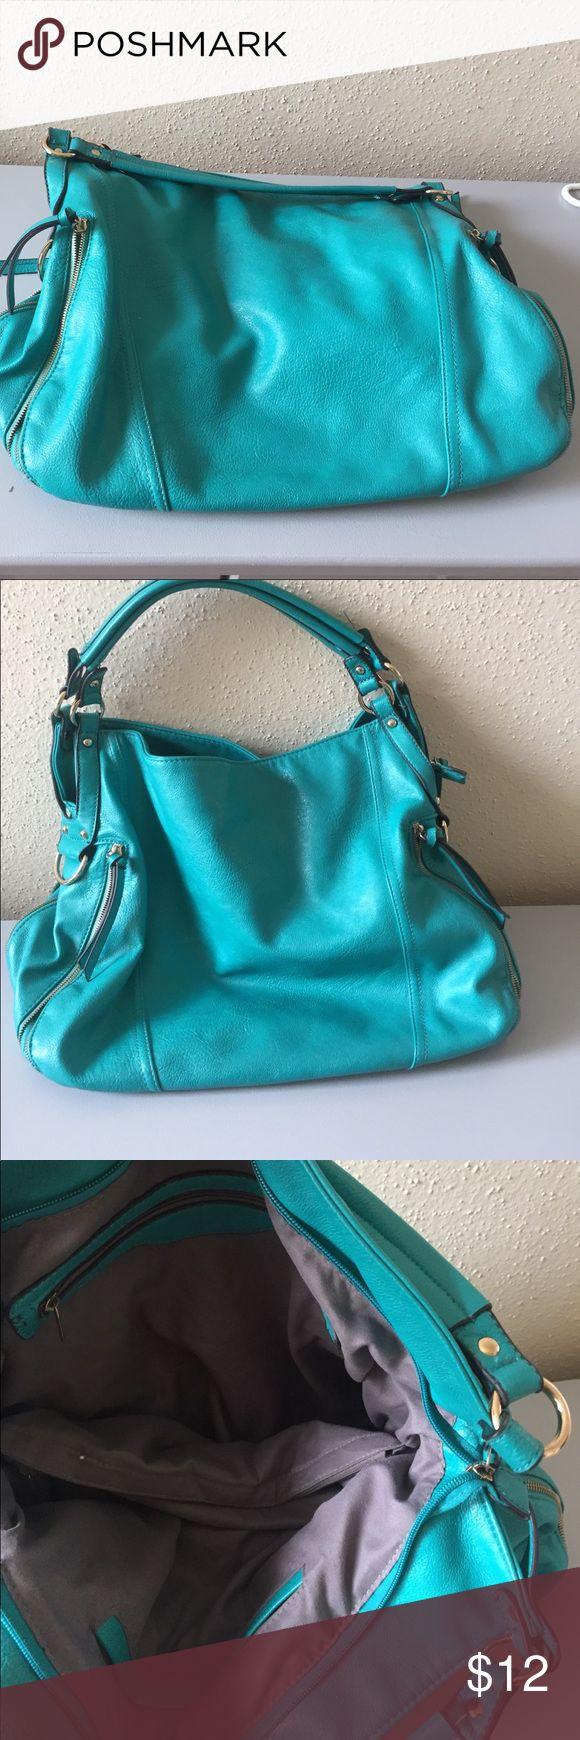 Teal purse Teal purse Bags Satchels